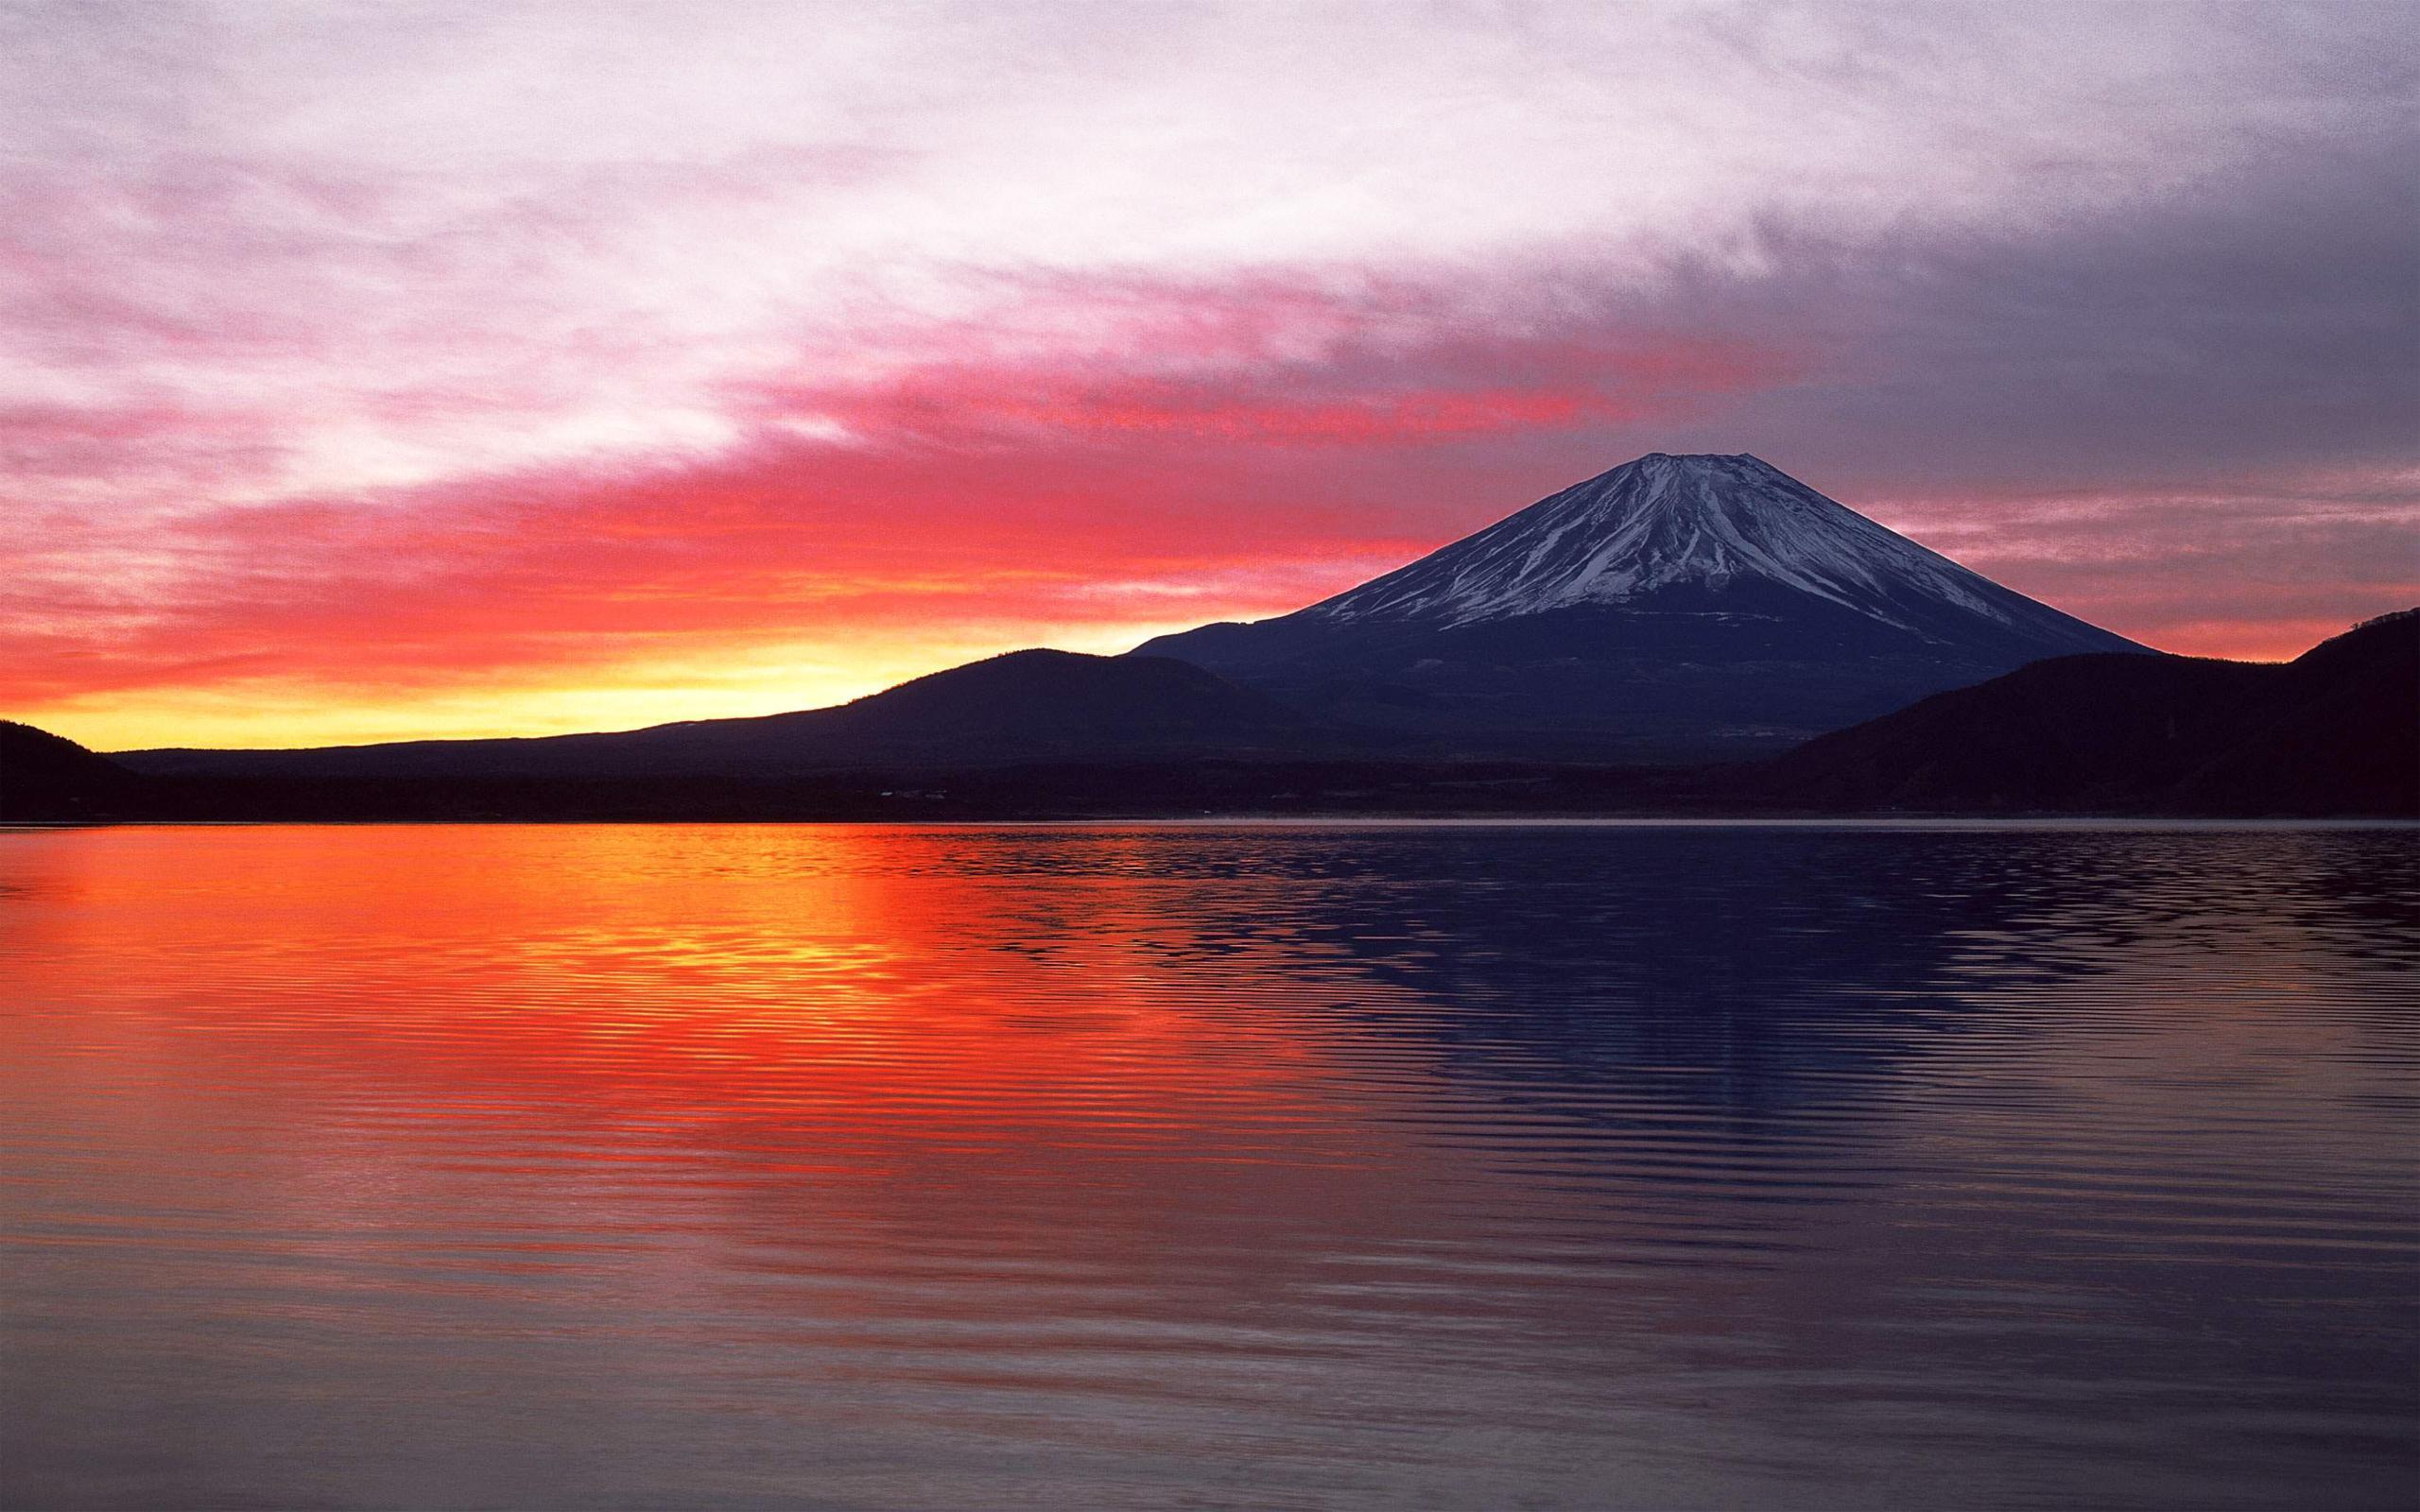 Mount Fuji Hd Wallpaper